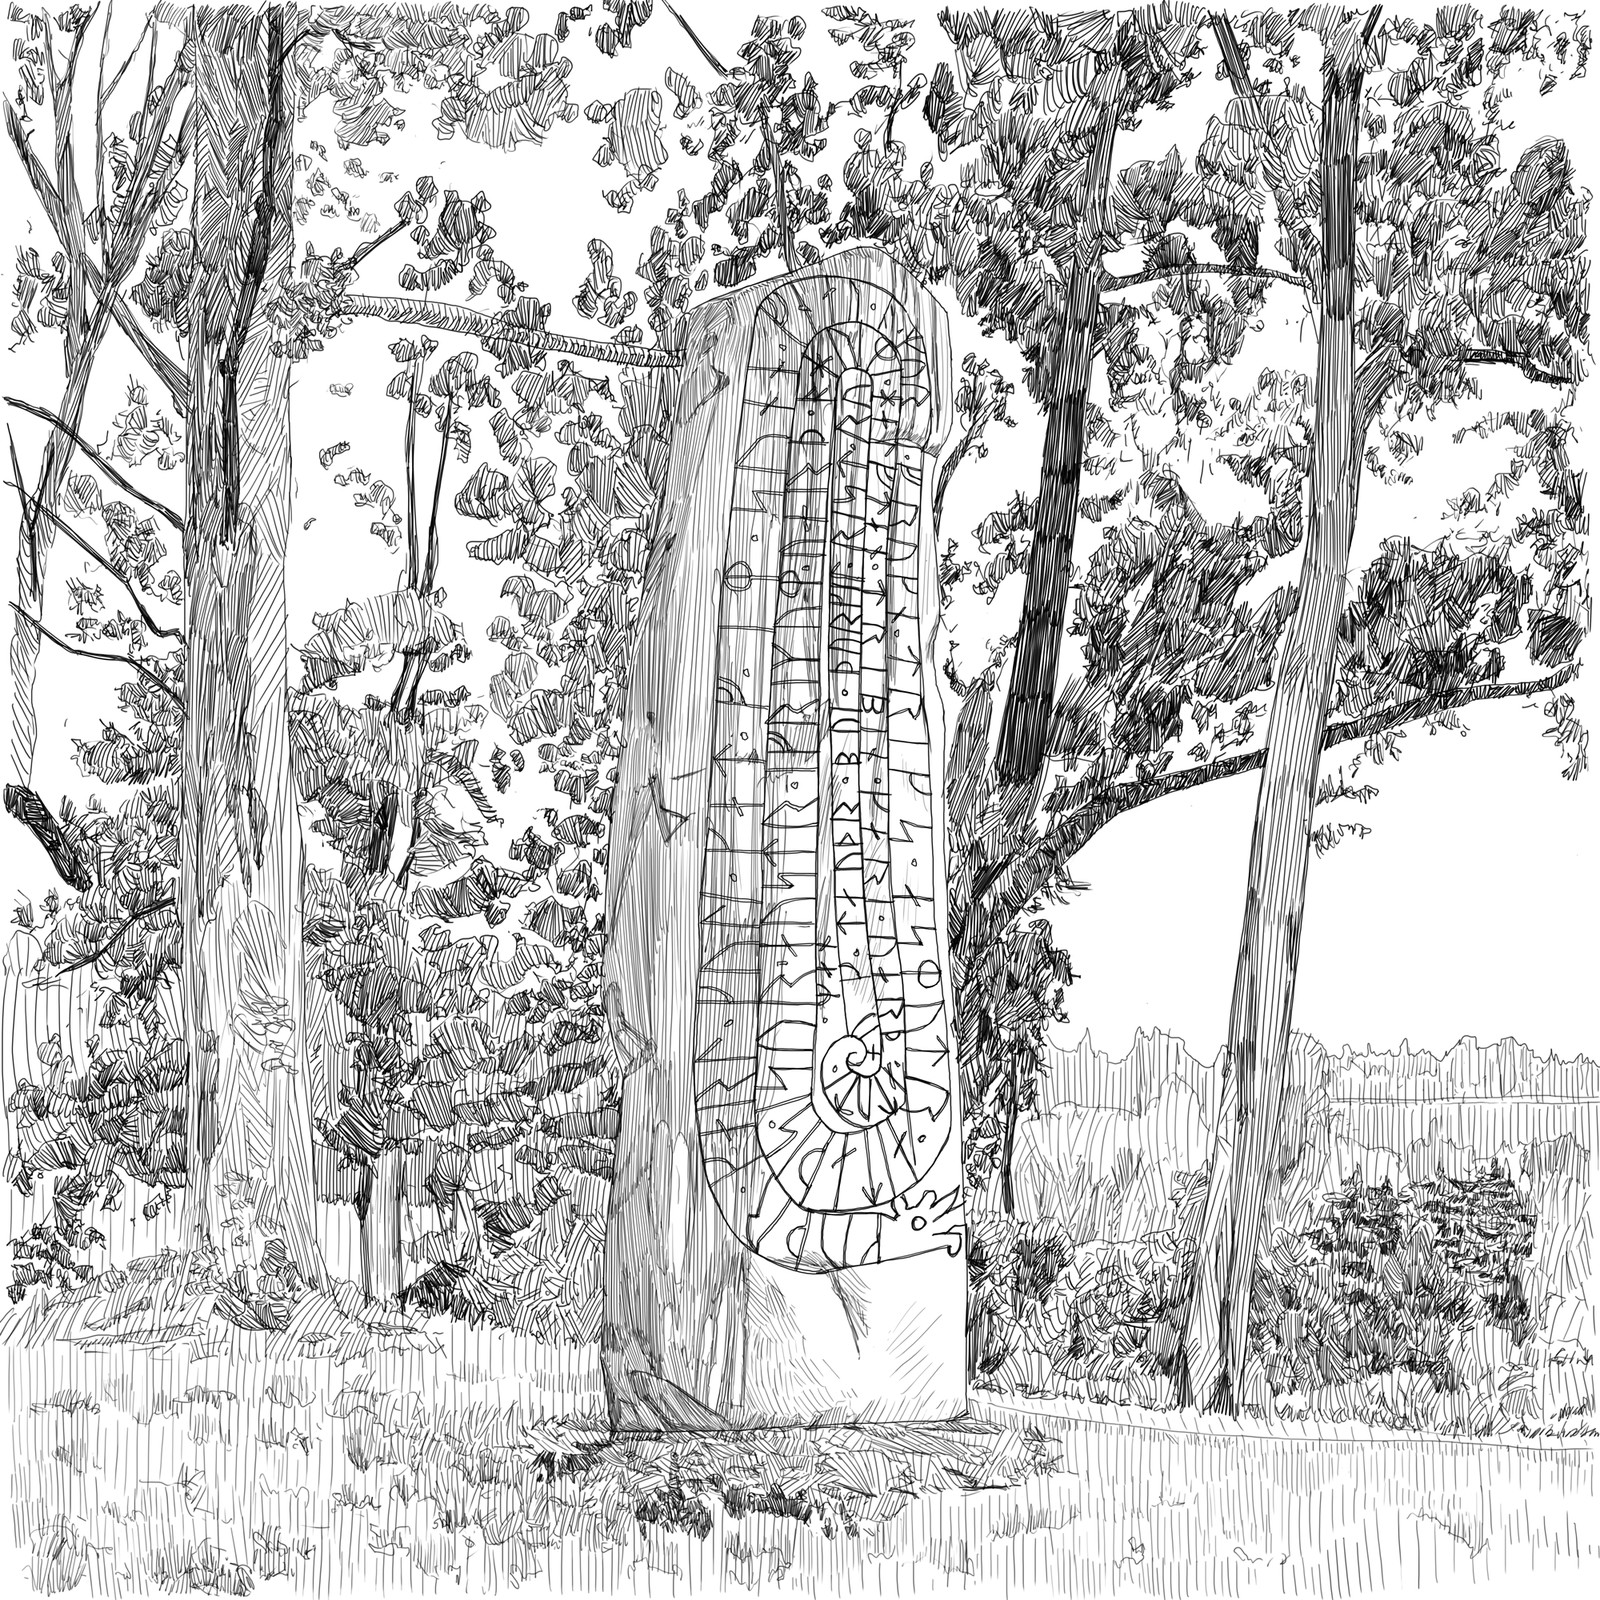 Högby Runestone